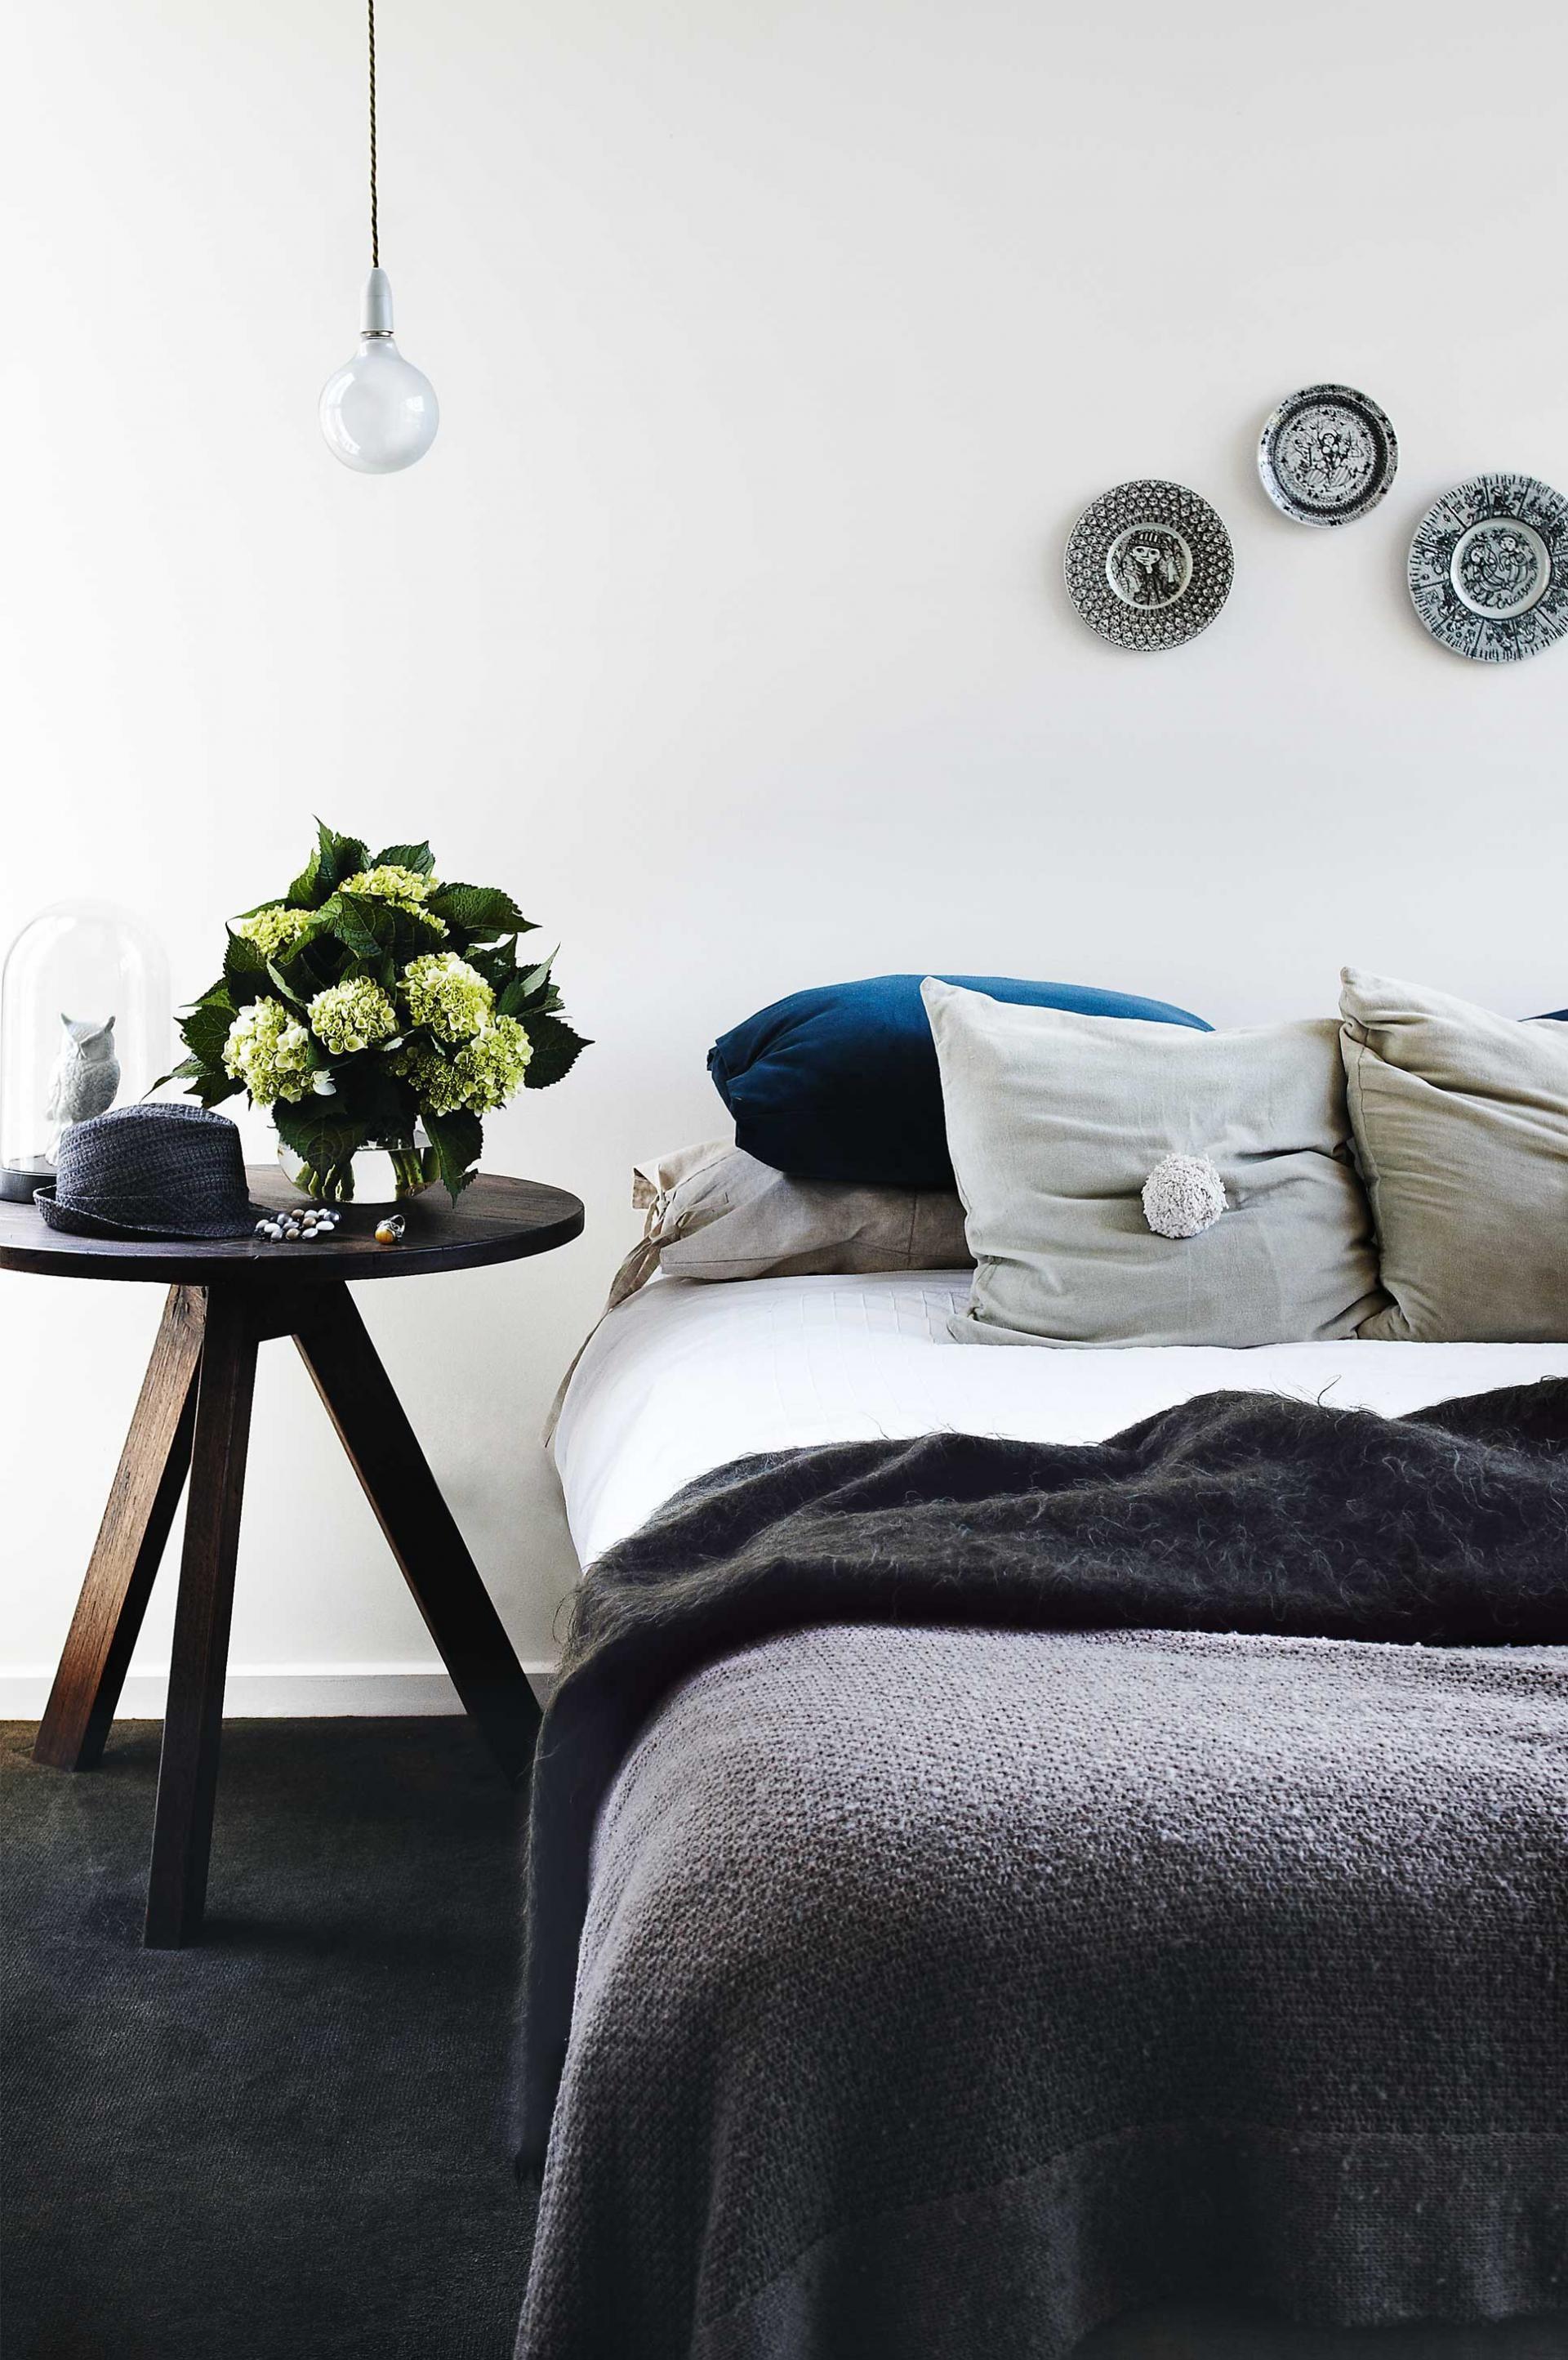 Master bedroom wardrobe designs inside  Cosy bedrooms for a good nightus sleep Styling by mrjasongrant